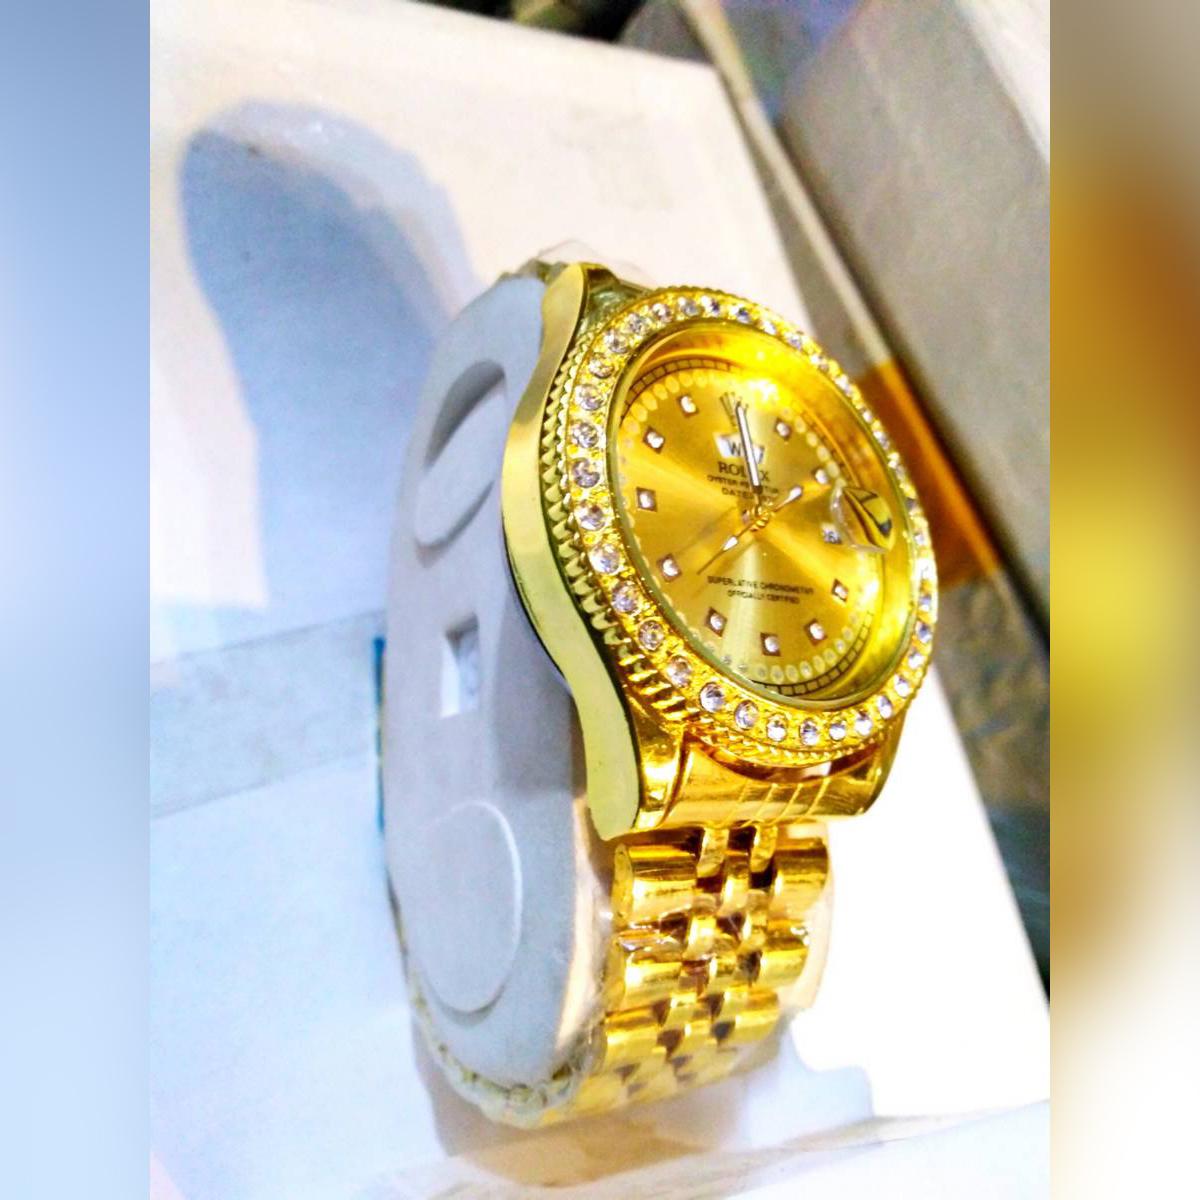 Luxury Gold Men's Wrist Watch Rich Quality Tourbillon Mechanical Waterproof Business Watch